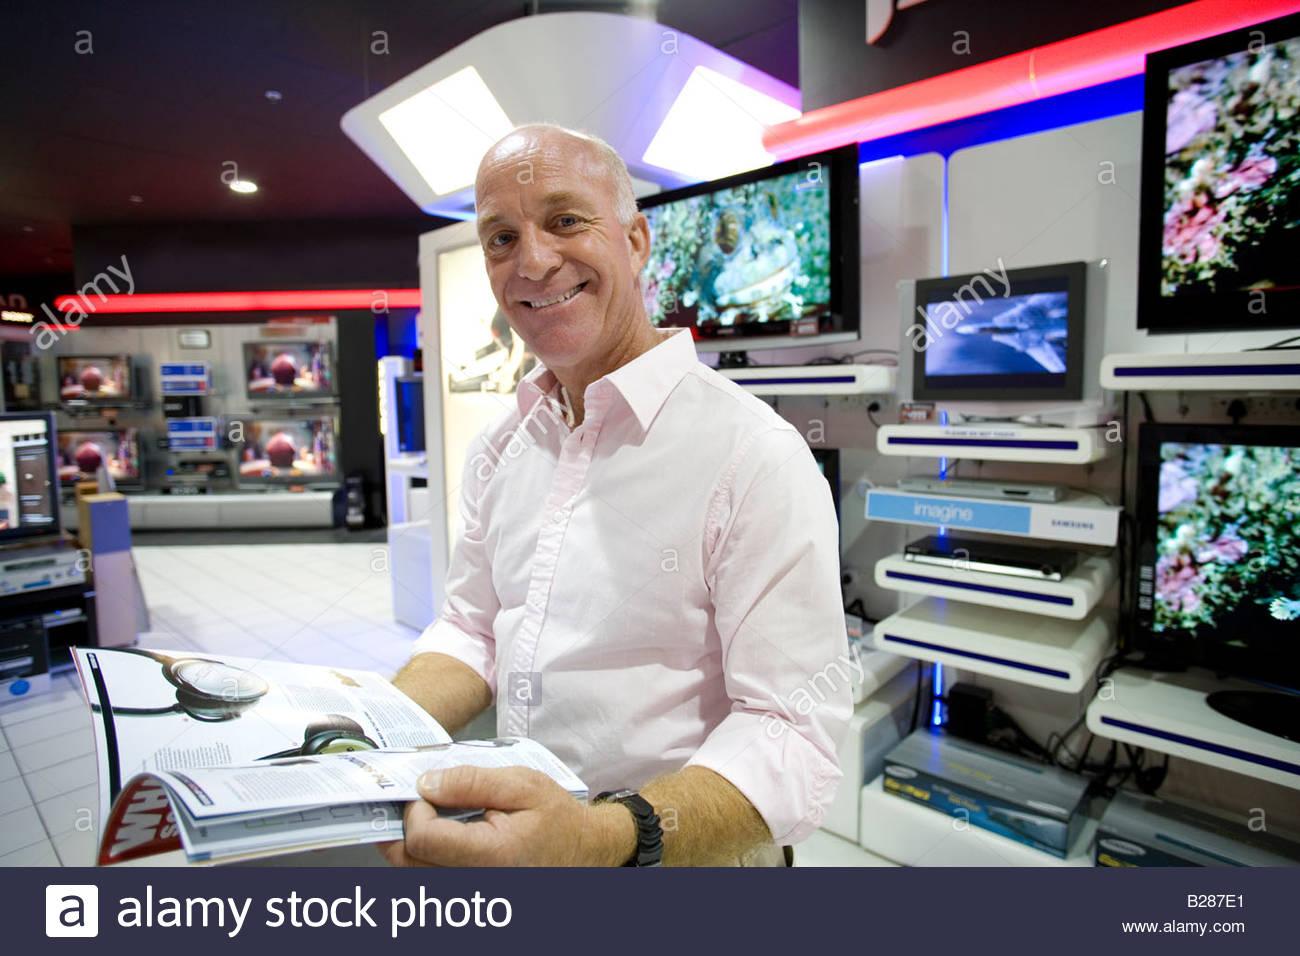 Mann mit Katalog im Elektronik-Geschäft, Lächeln, Porträt Stockbild